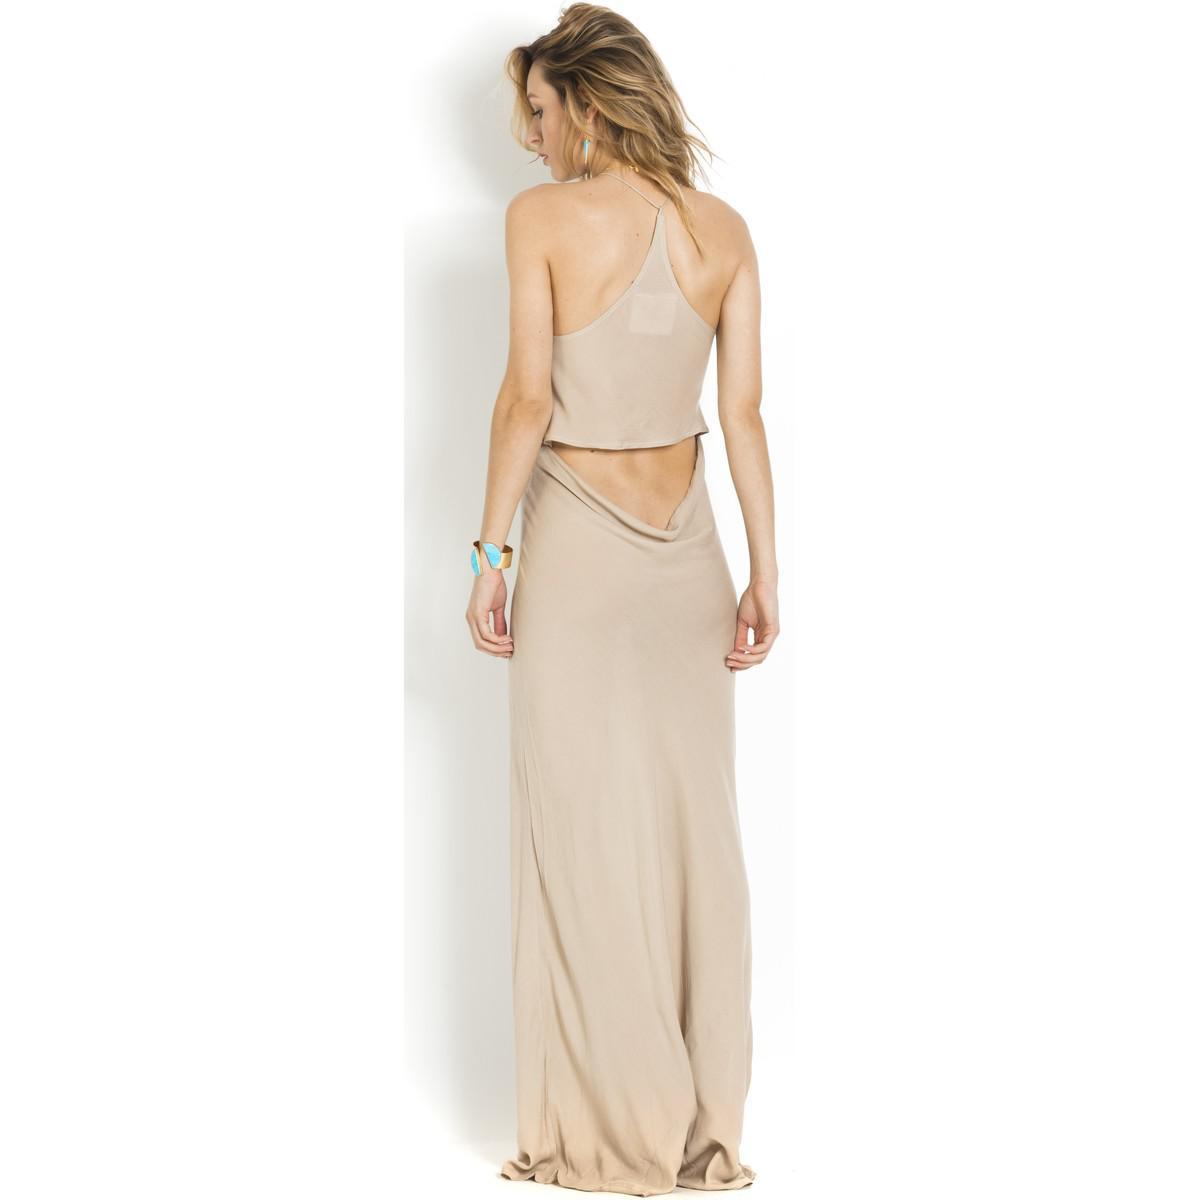 Long Beach wear ACACIA Clay - Maliko Acacia Swimwear mfizBF7mq